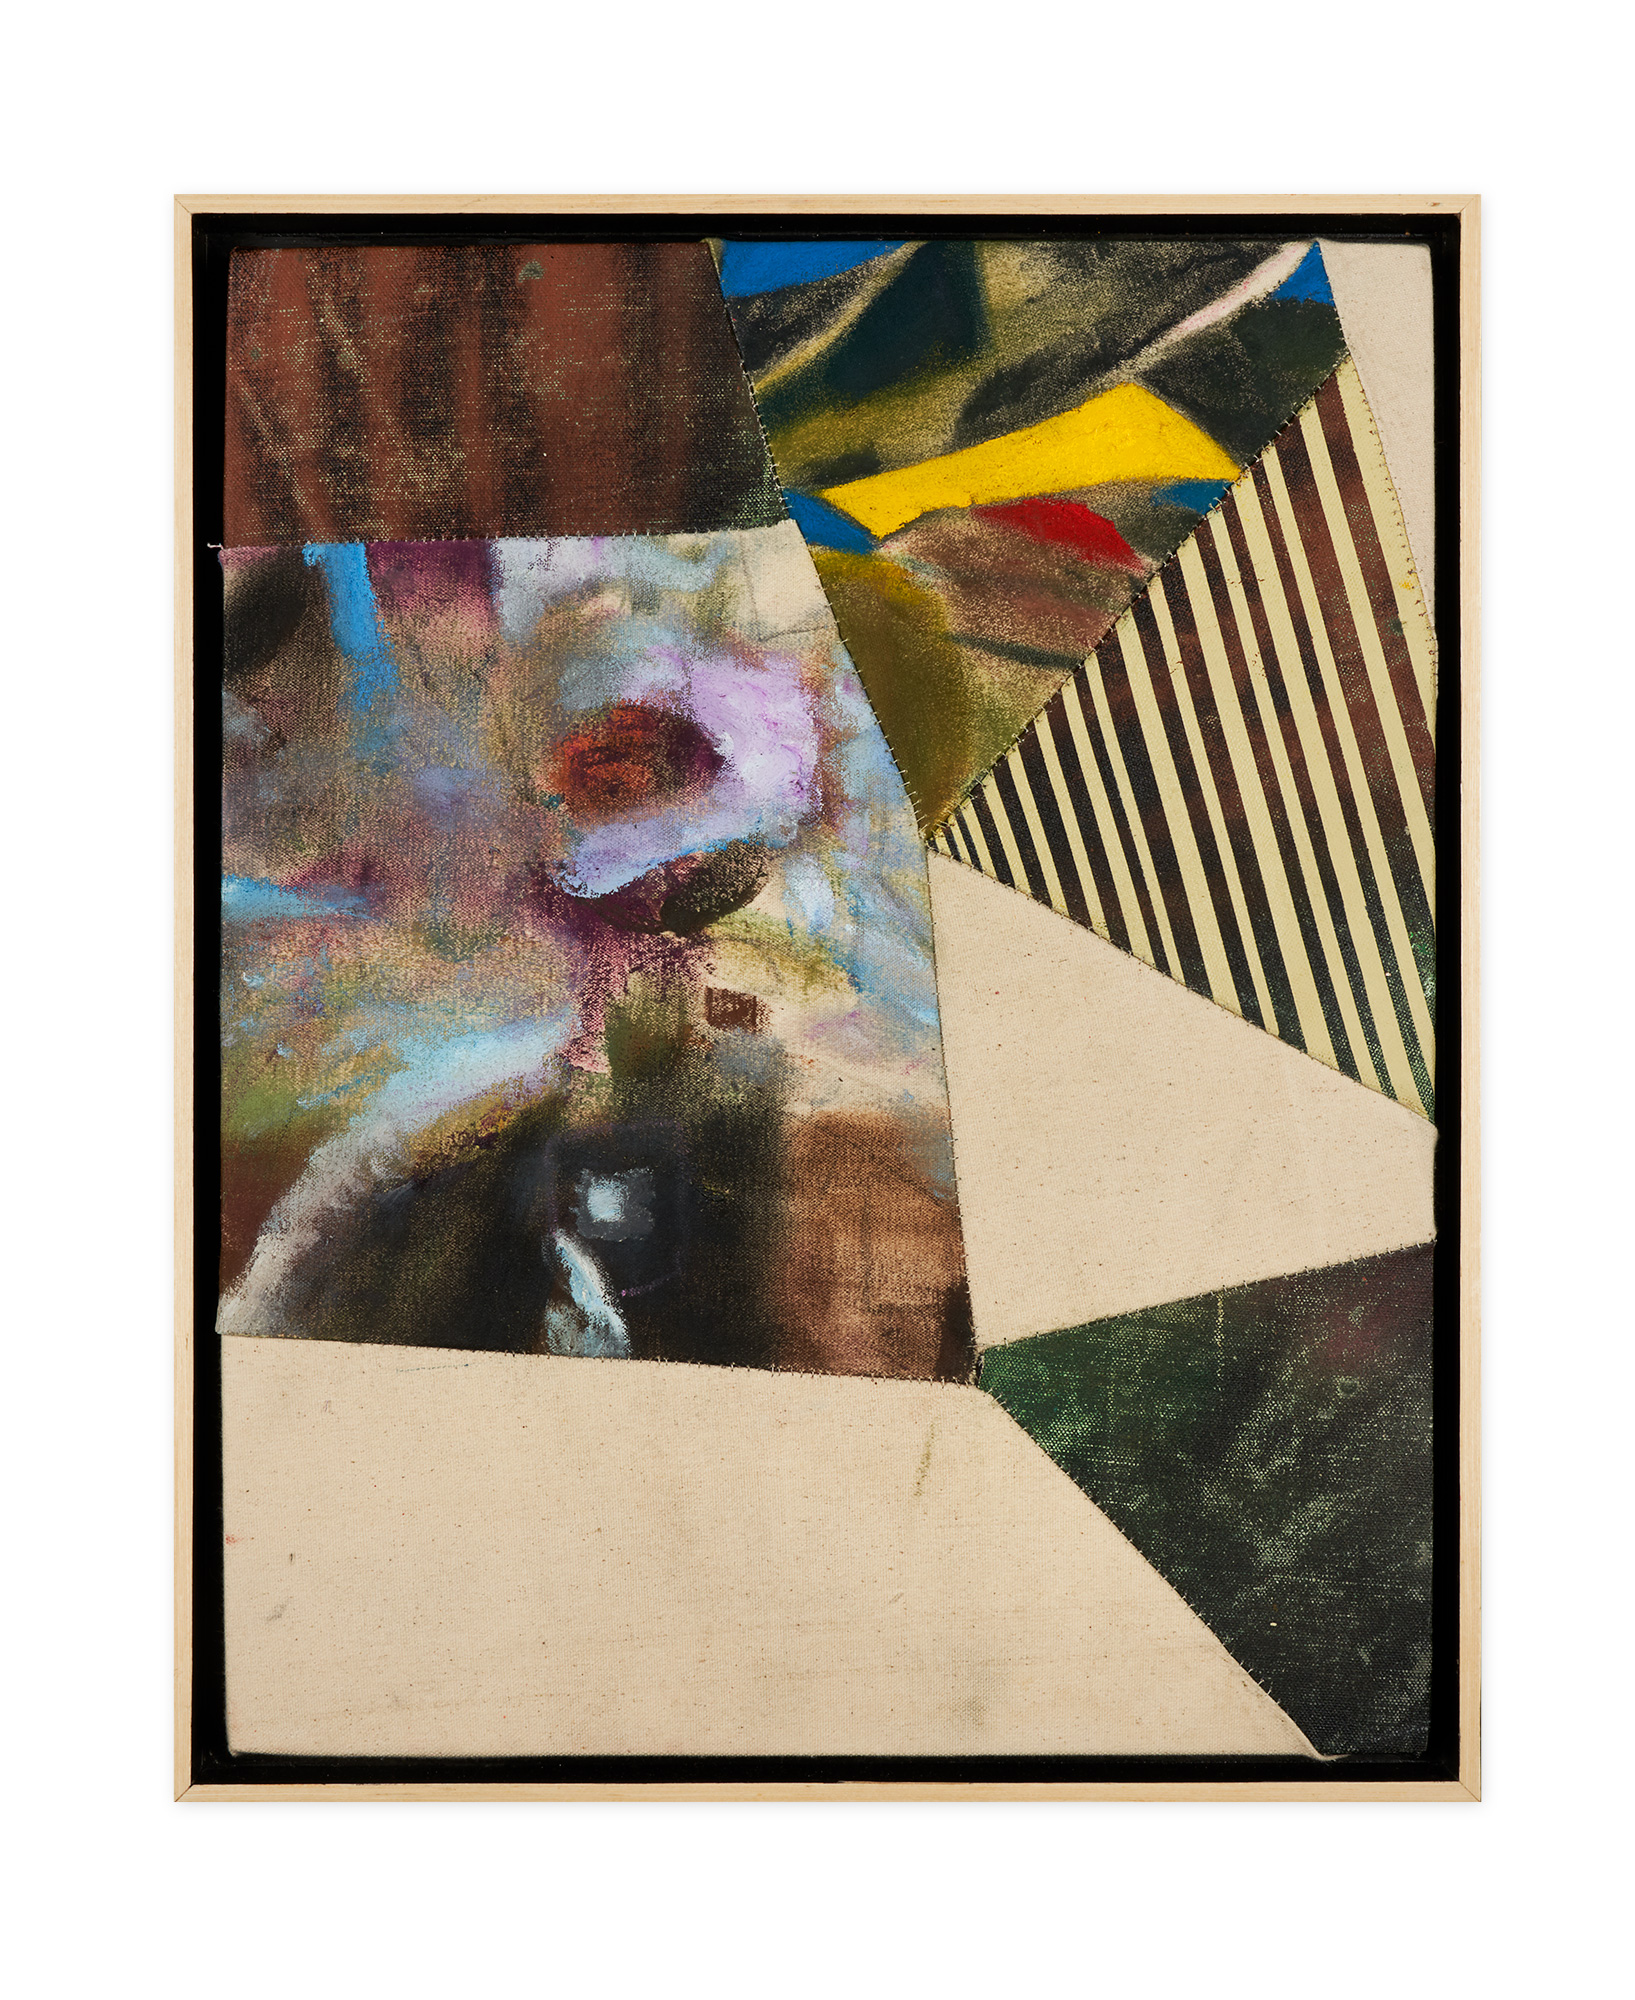 20190502_Santiago-Escobedo-Garcia_Paintings_P40_vertical_small-web.jpg